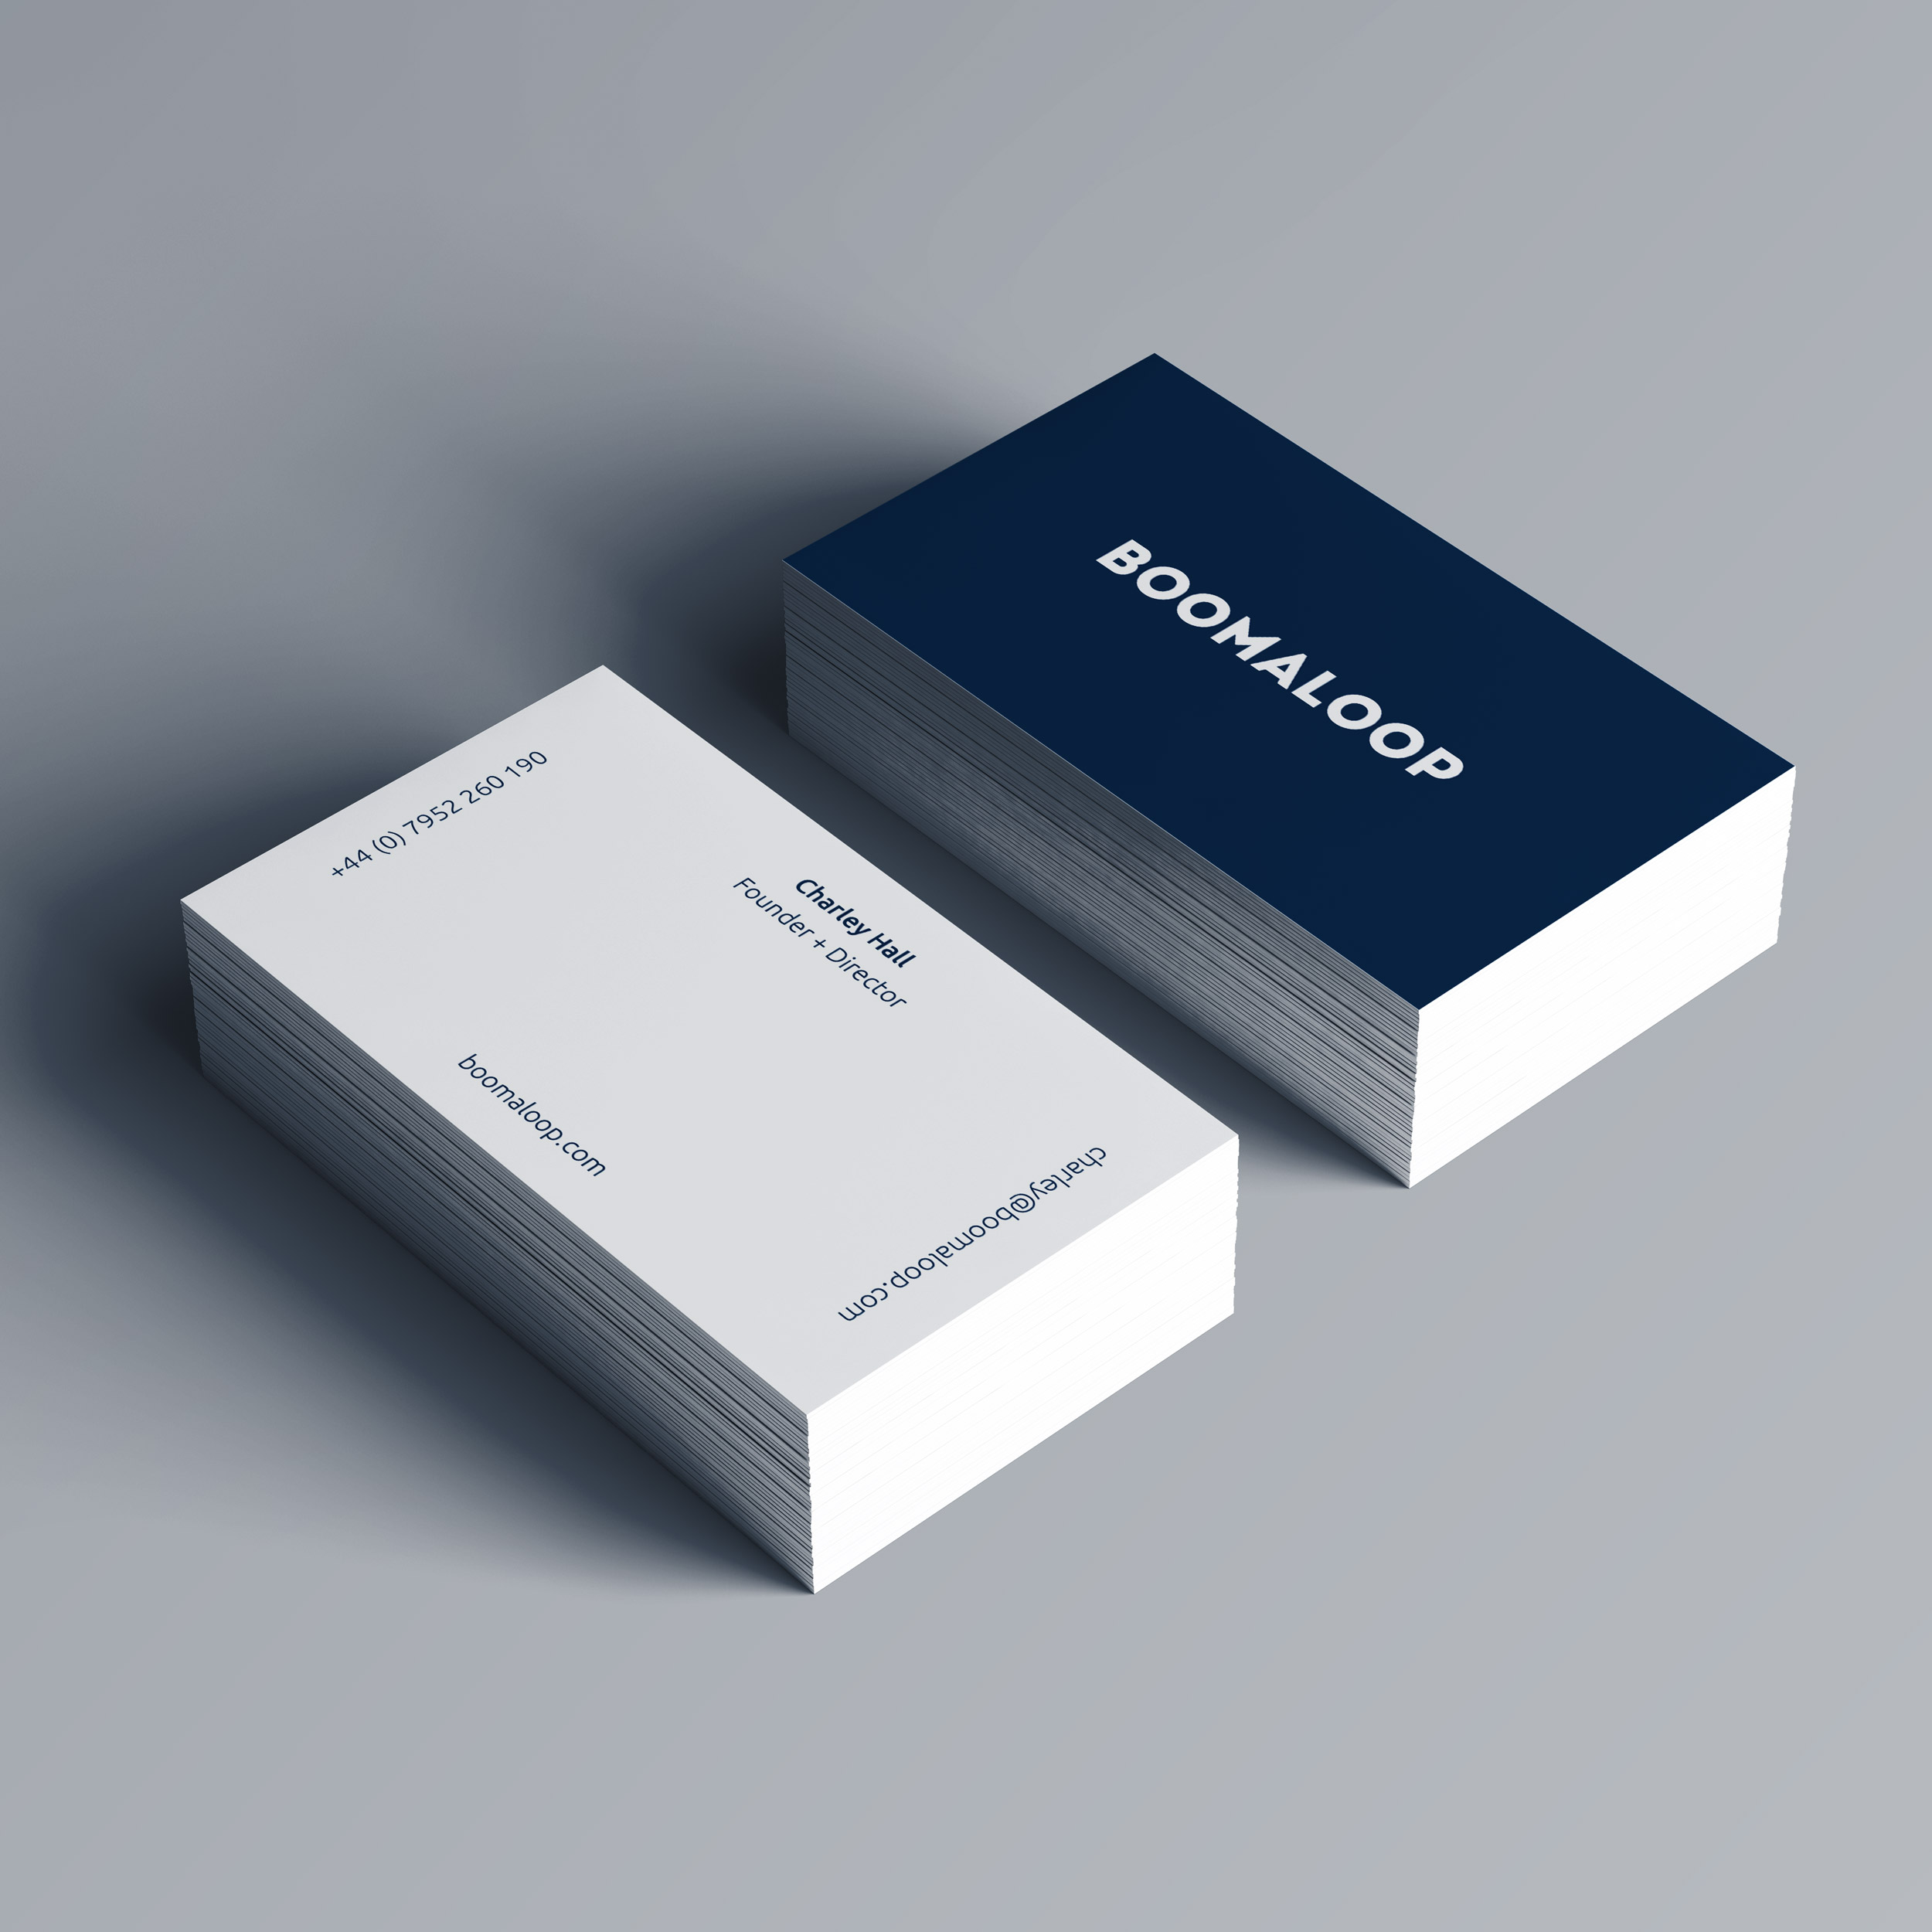 map-boomaloop-business-cards.jpg